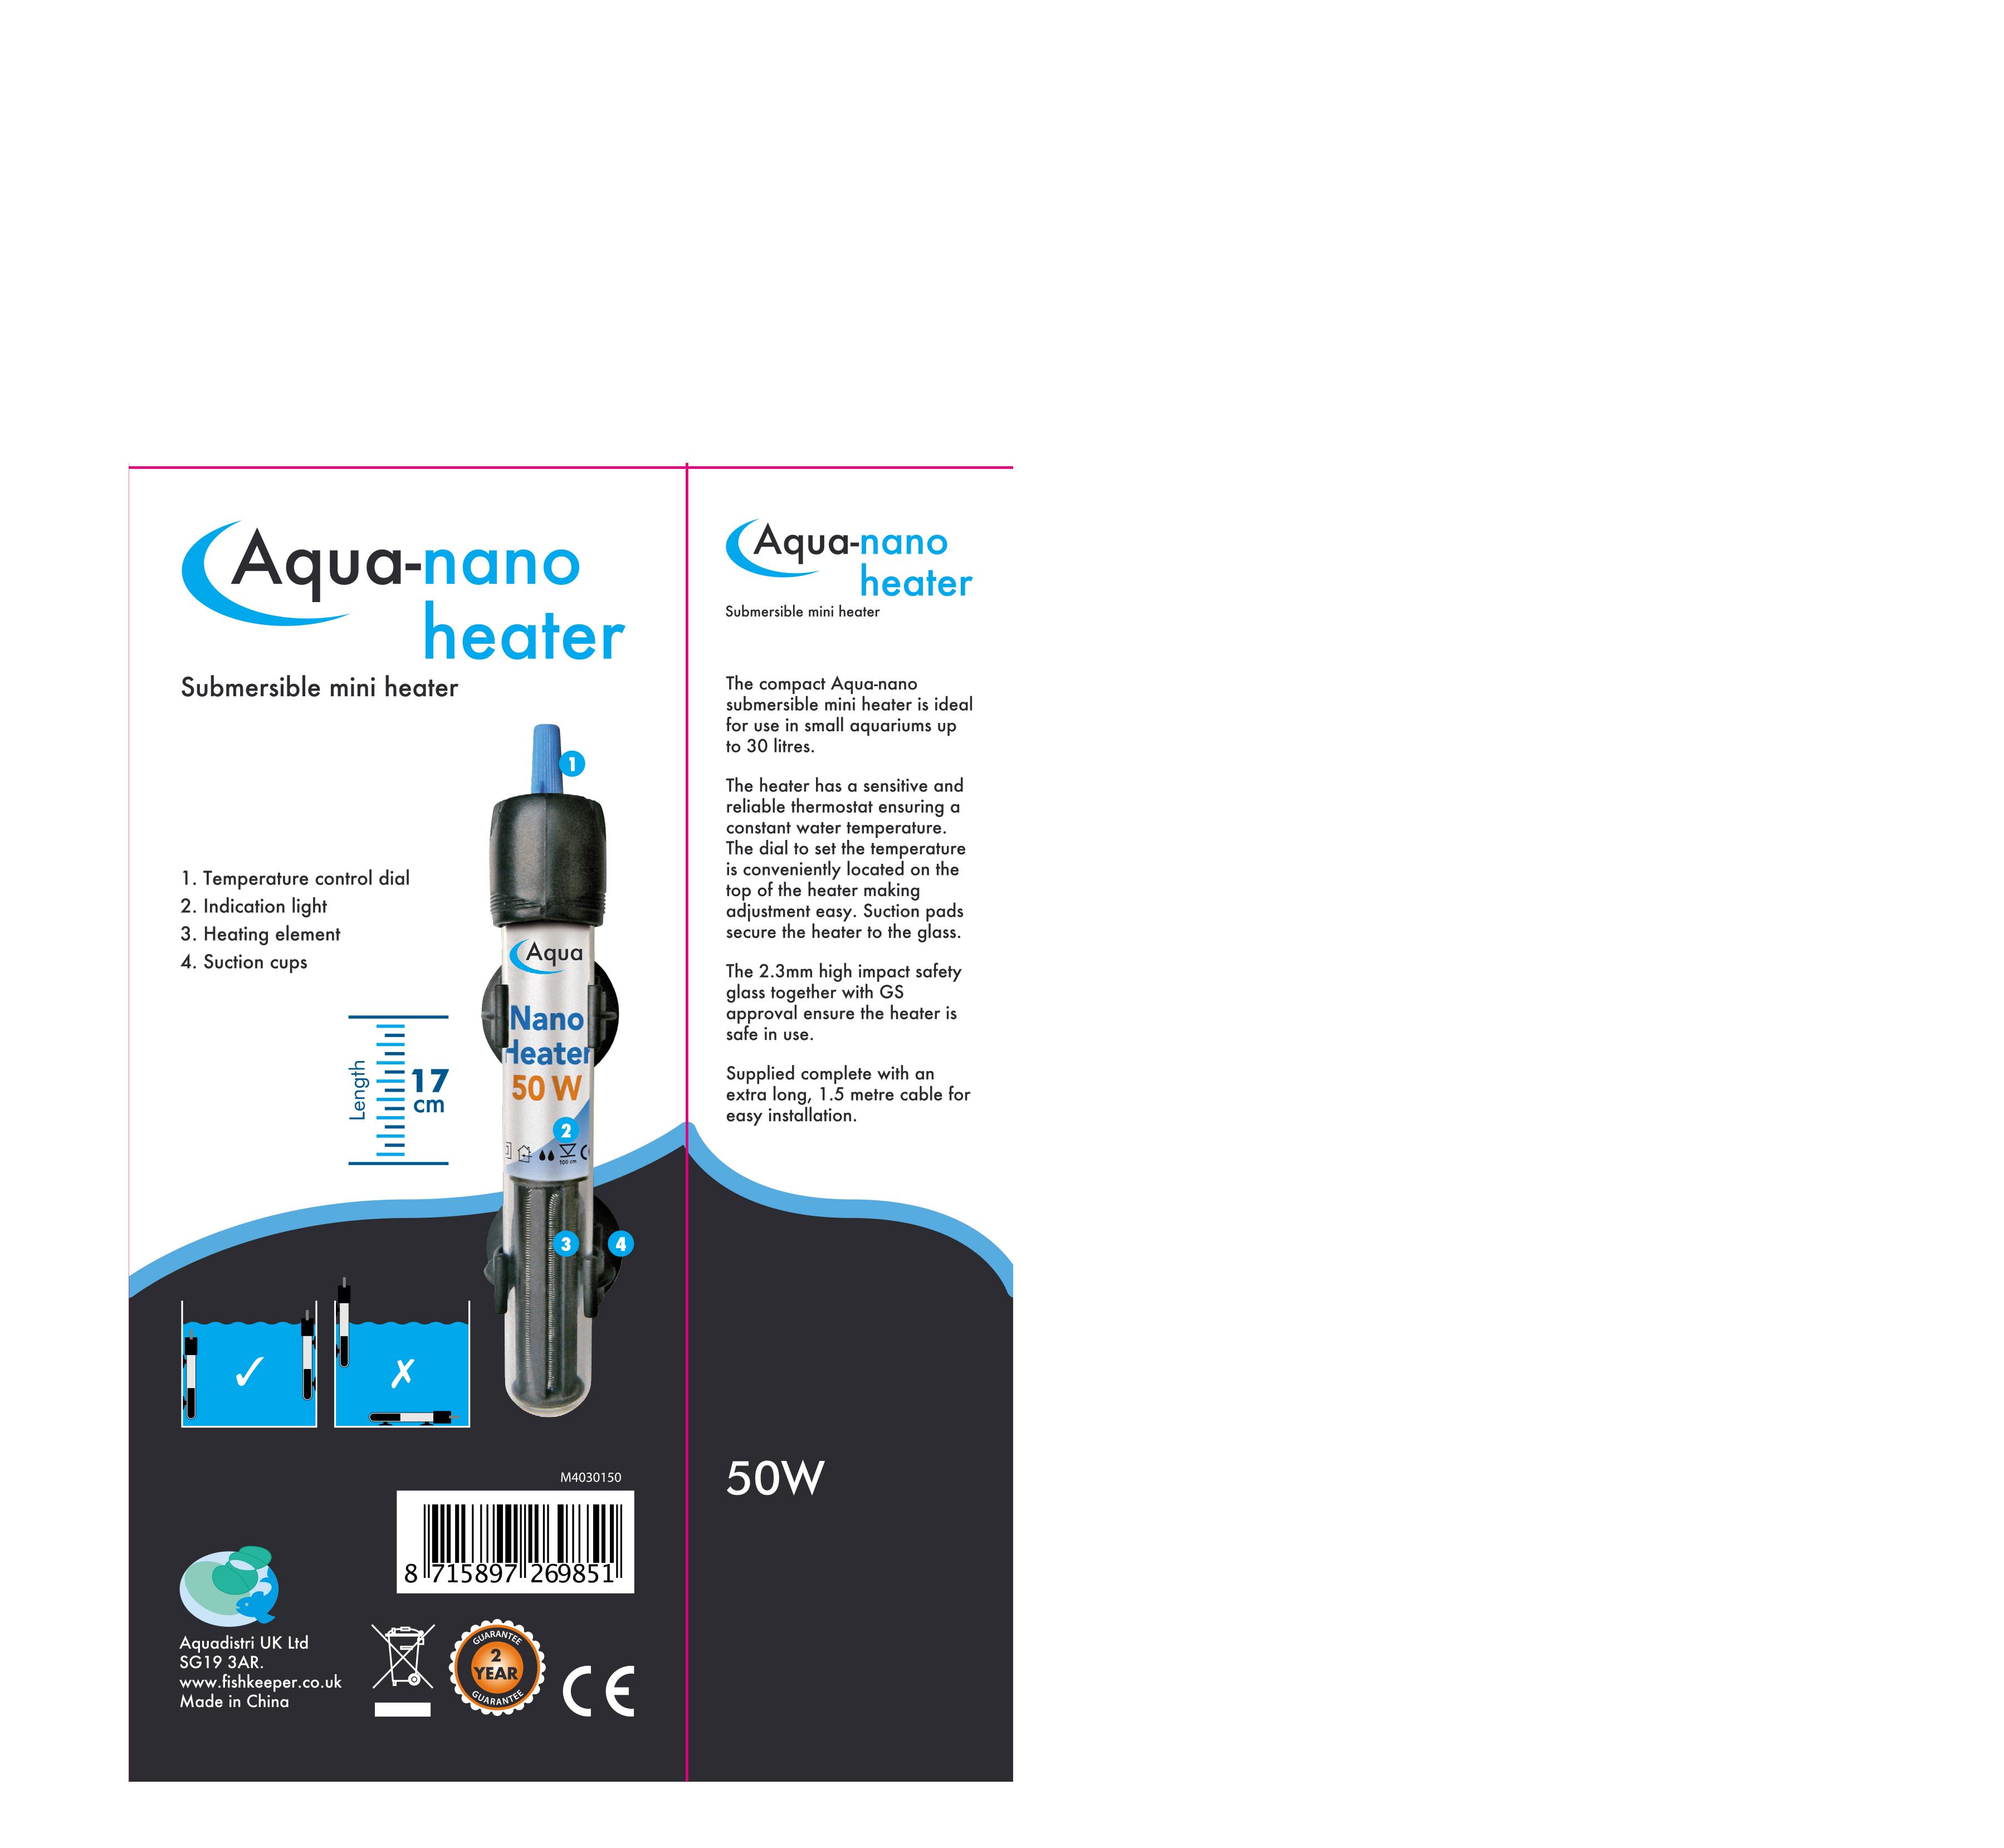 M4030150 Aqua Nano Heater 50W Highres 1467718599